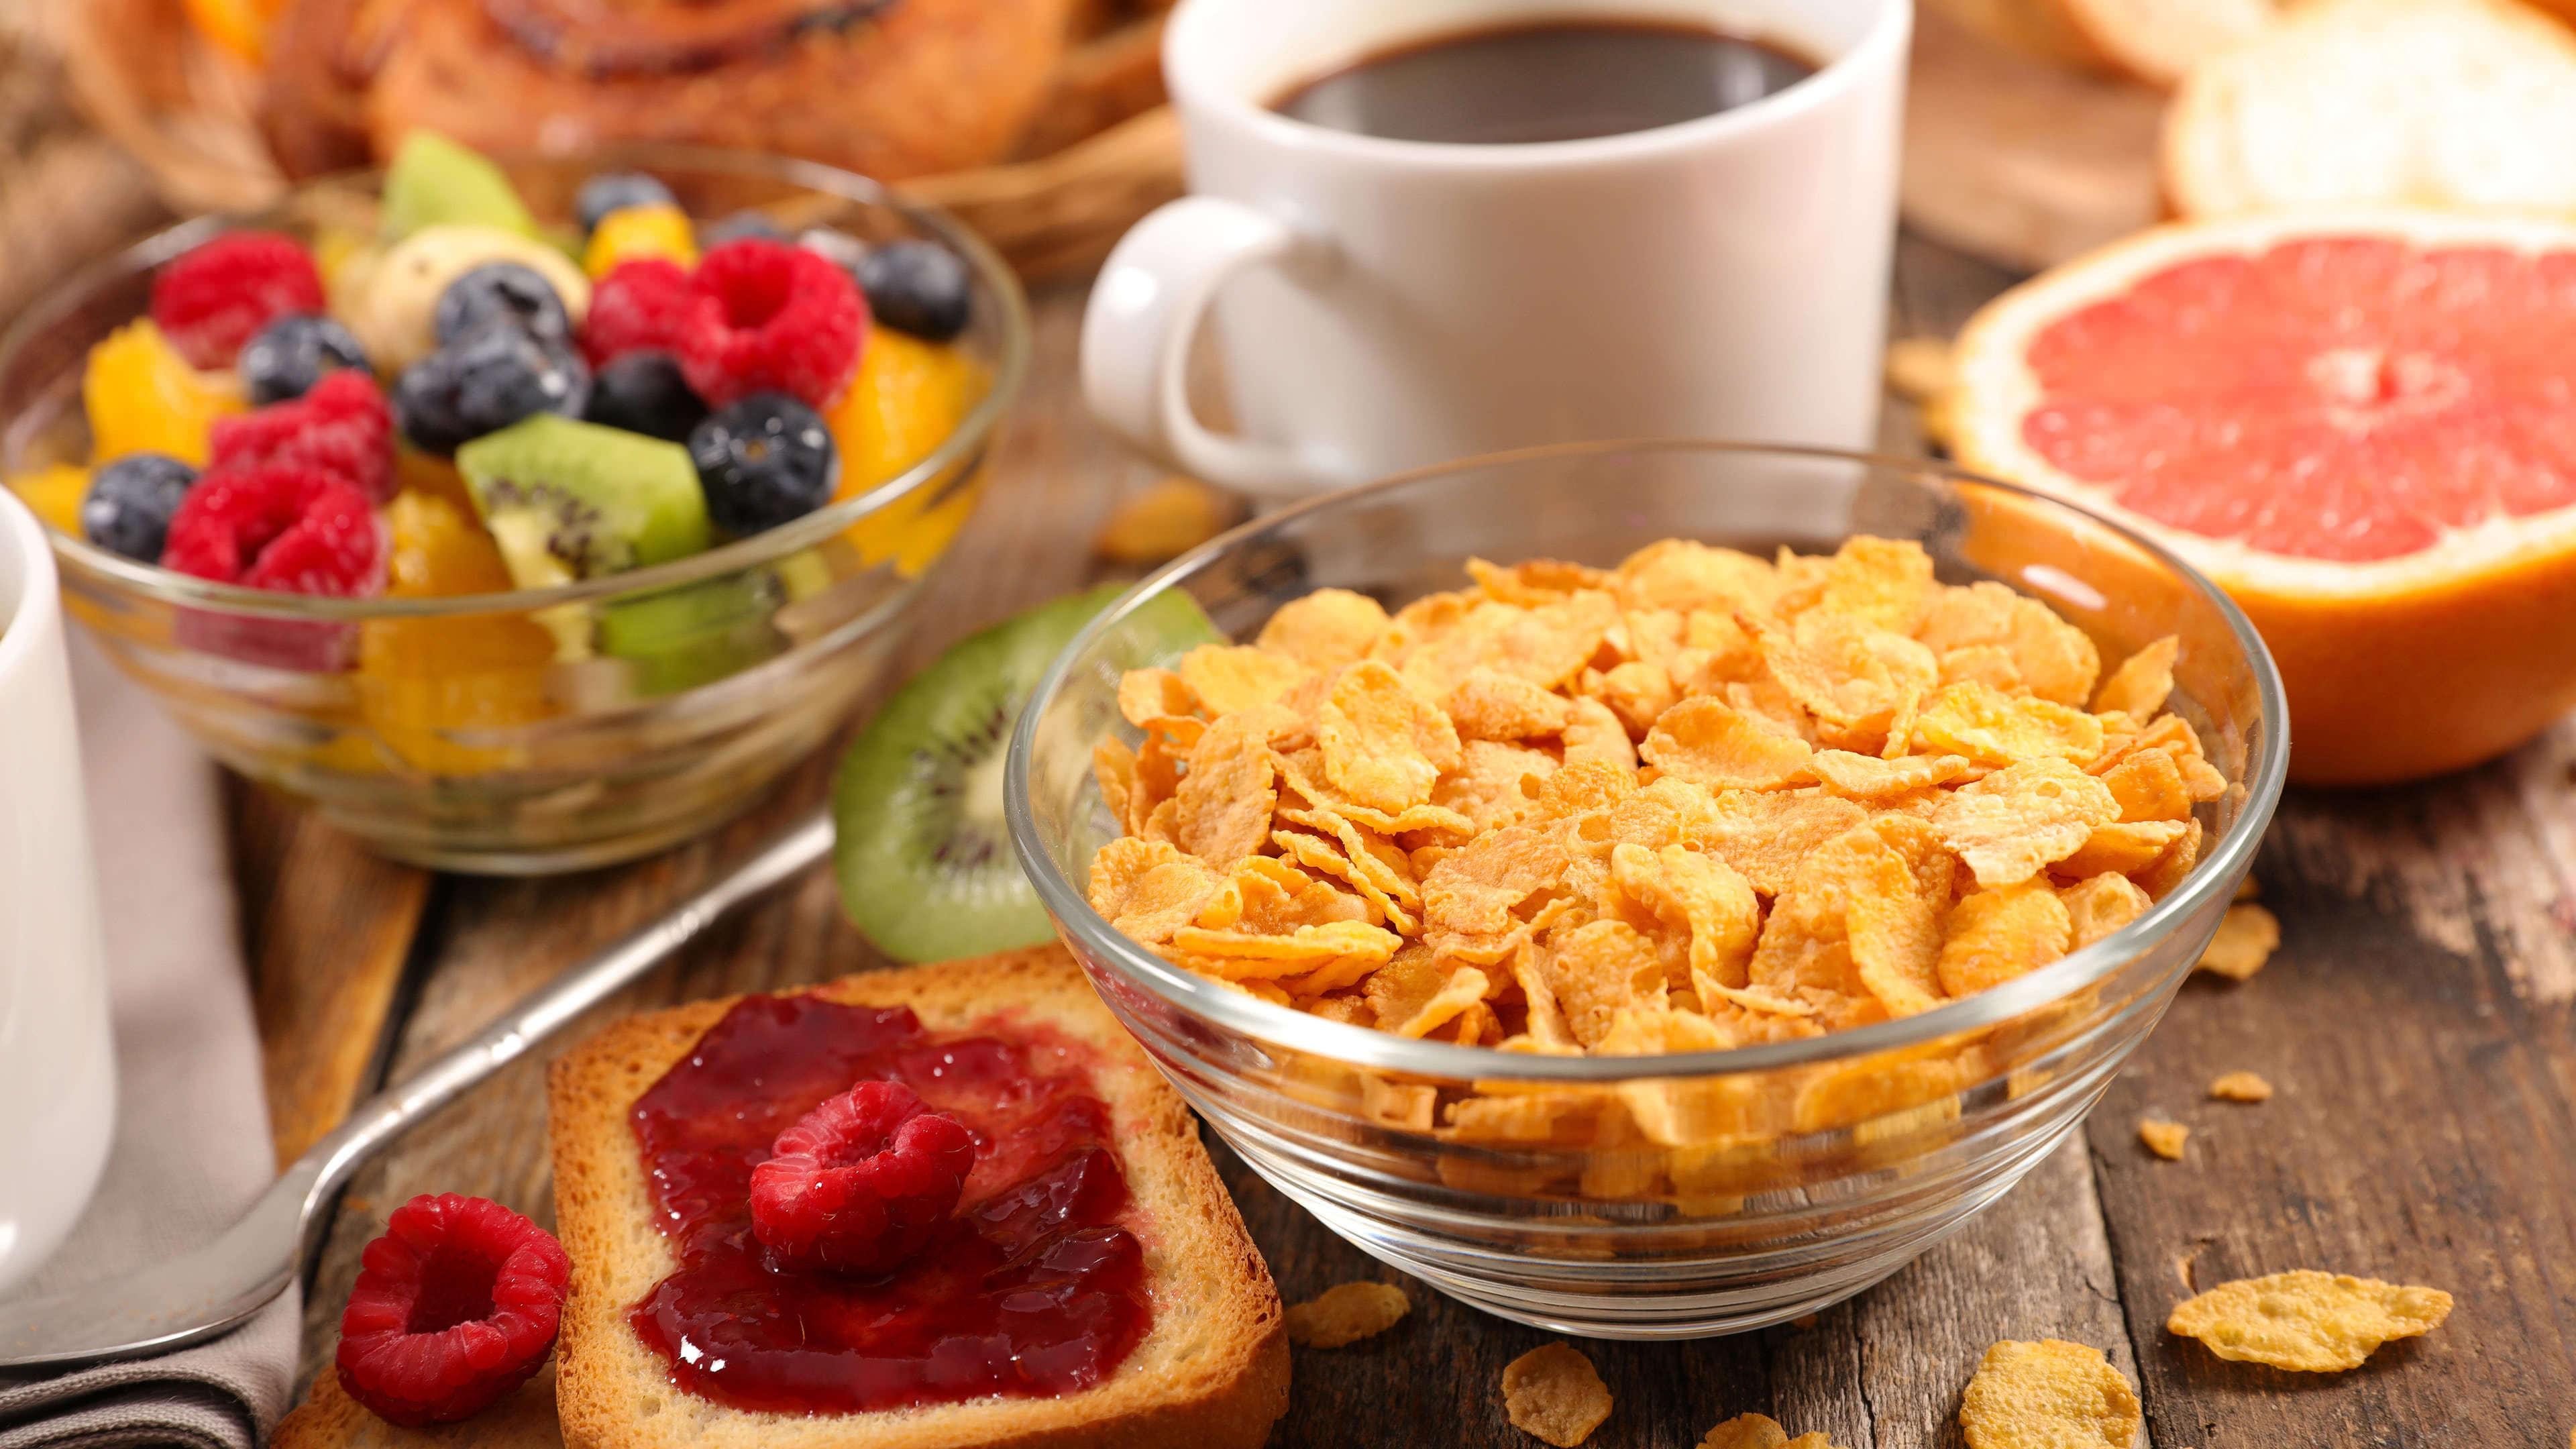 corn flakes toast and fruit breakfast uhd 4k wallpaper